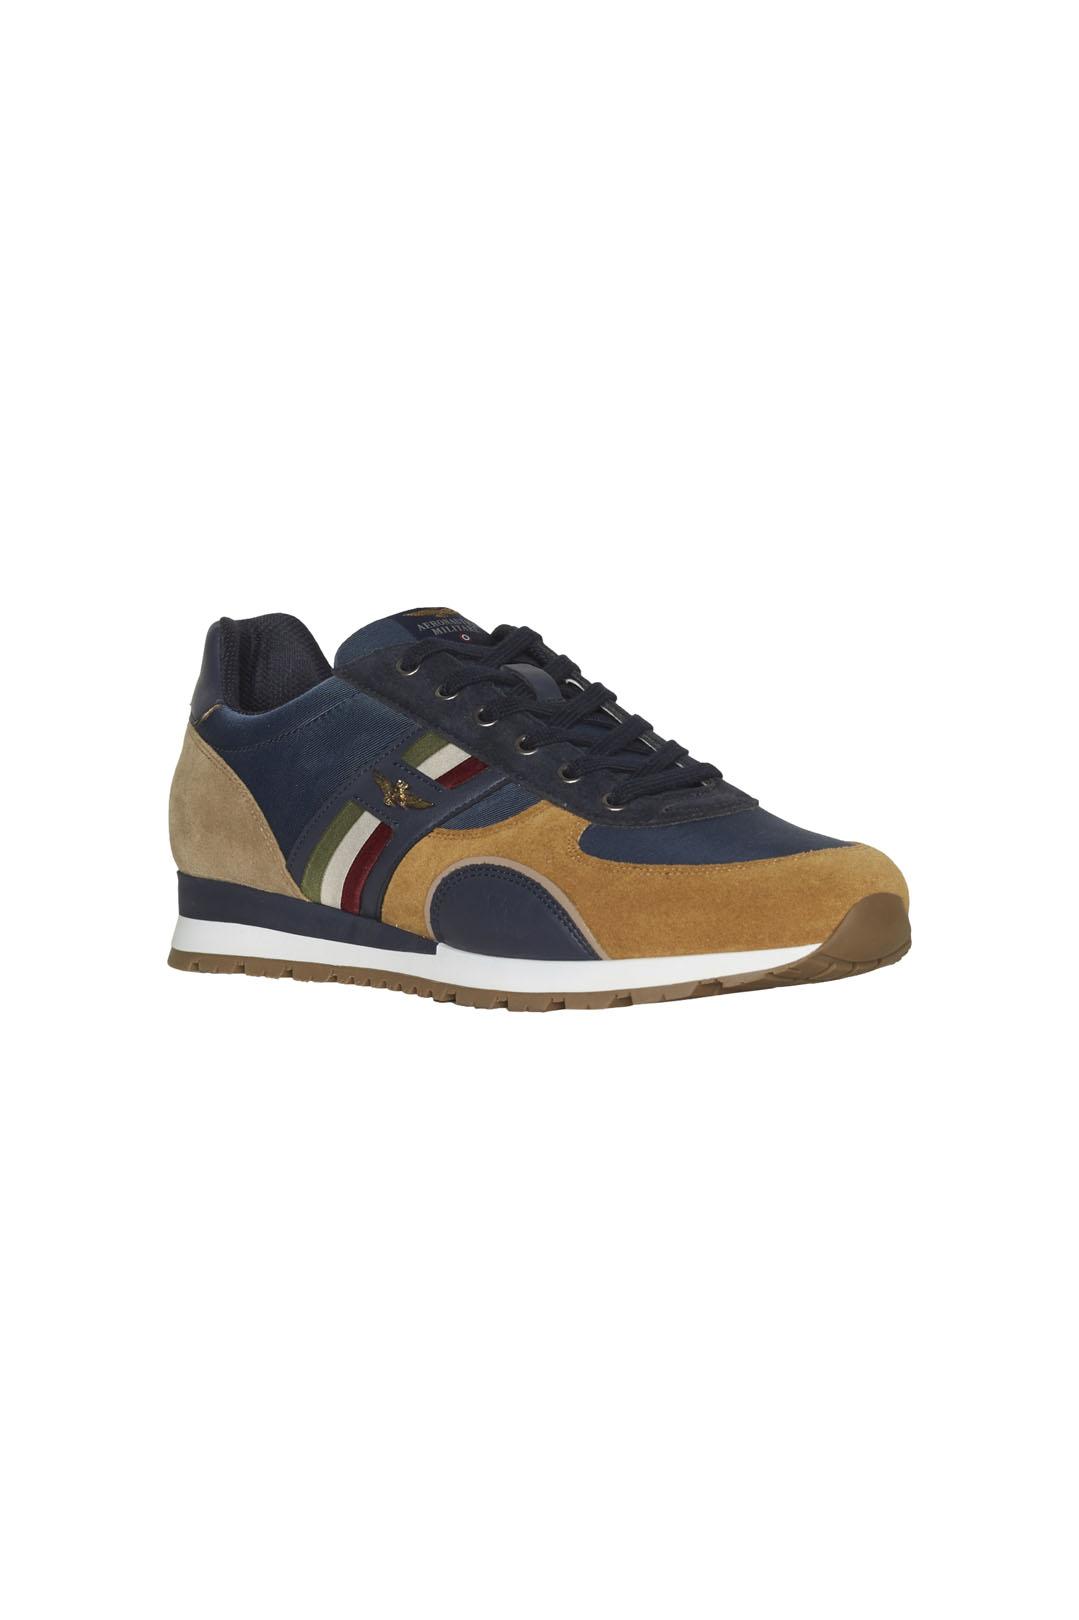 Sneakers mit Trikolor                    1